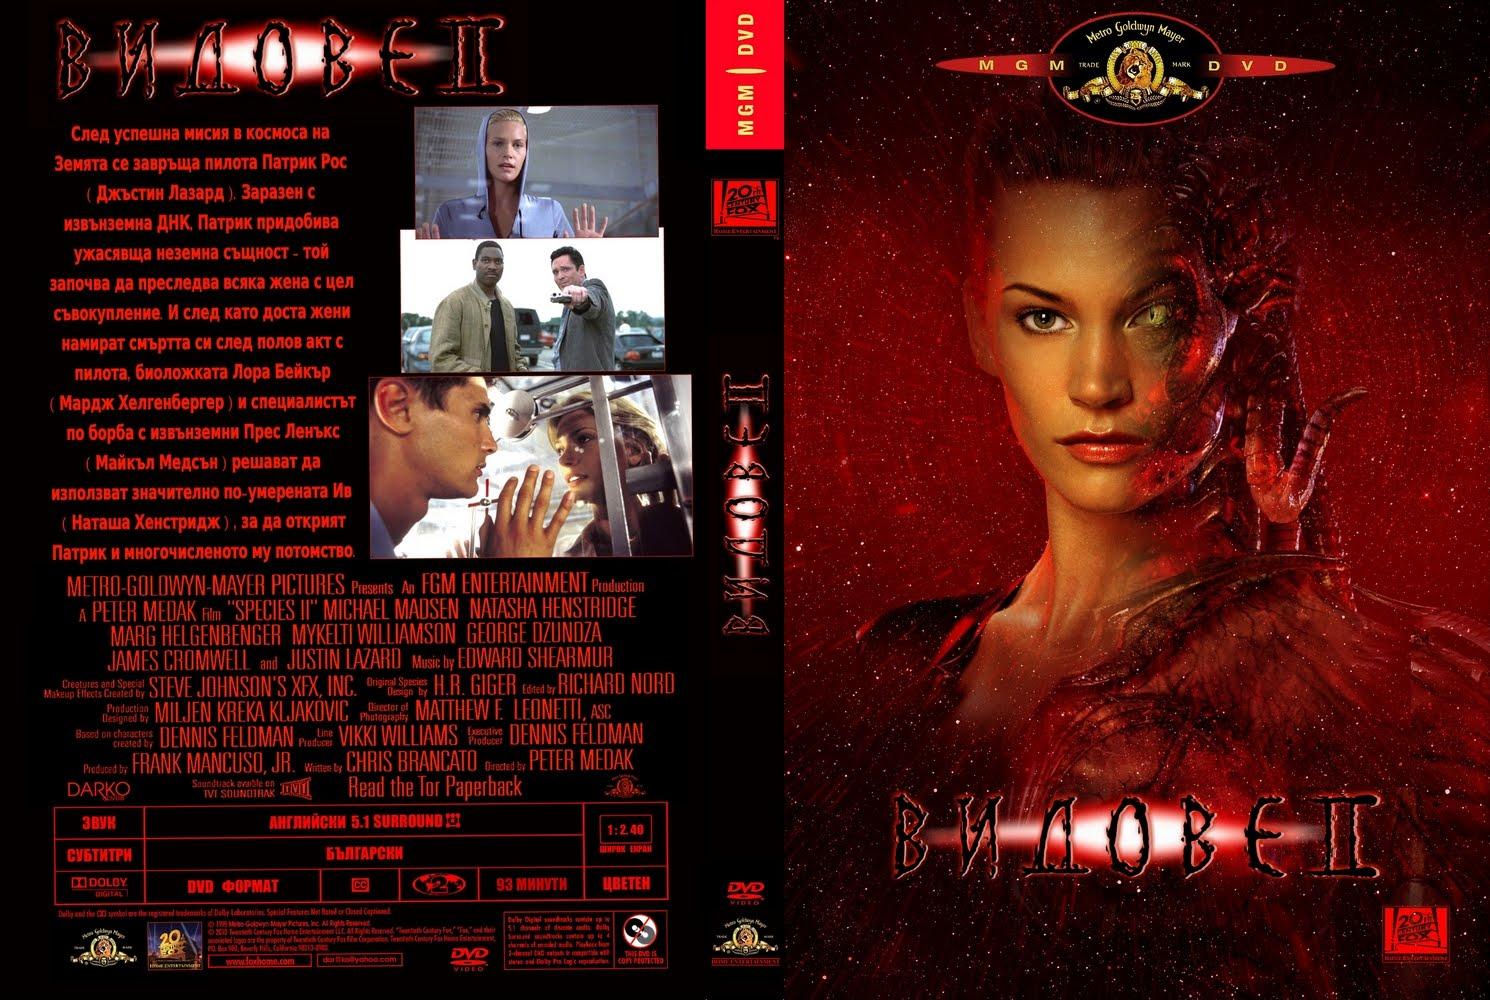 Image Gallery species 2 dvd